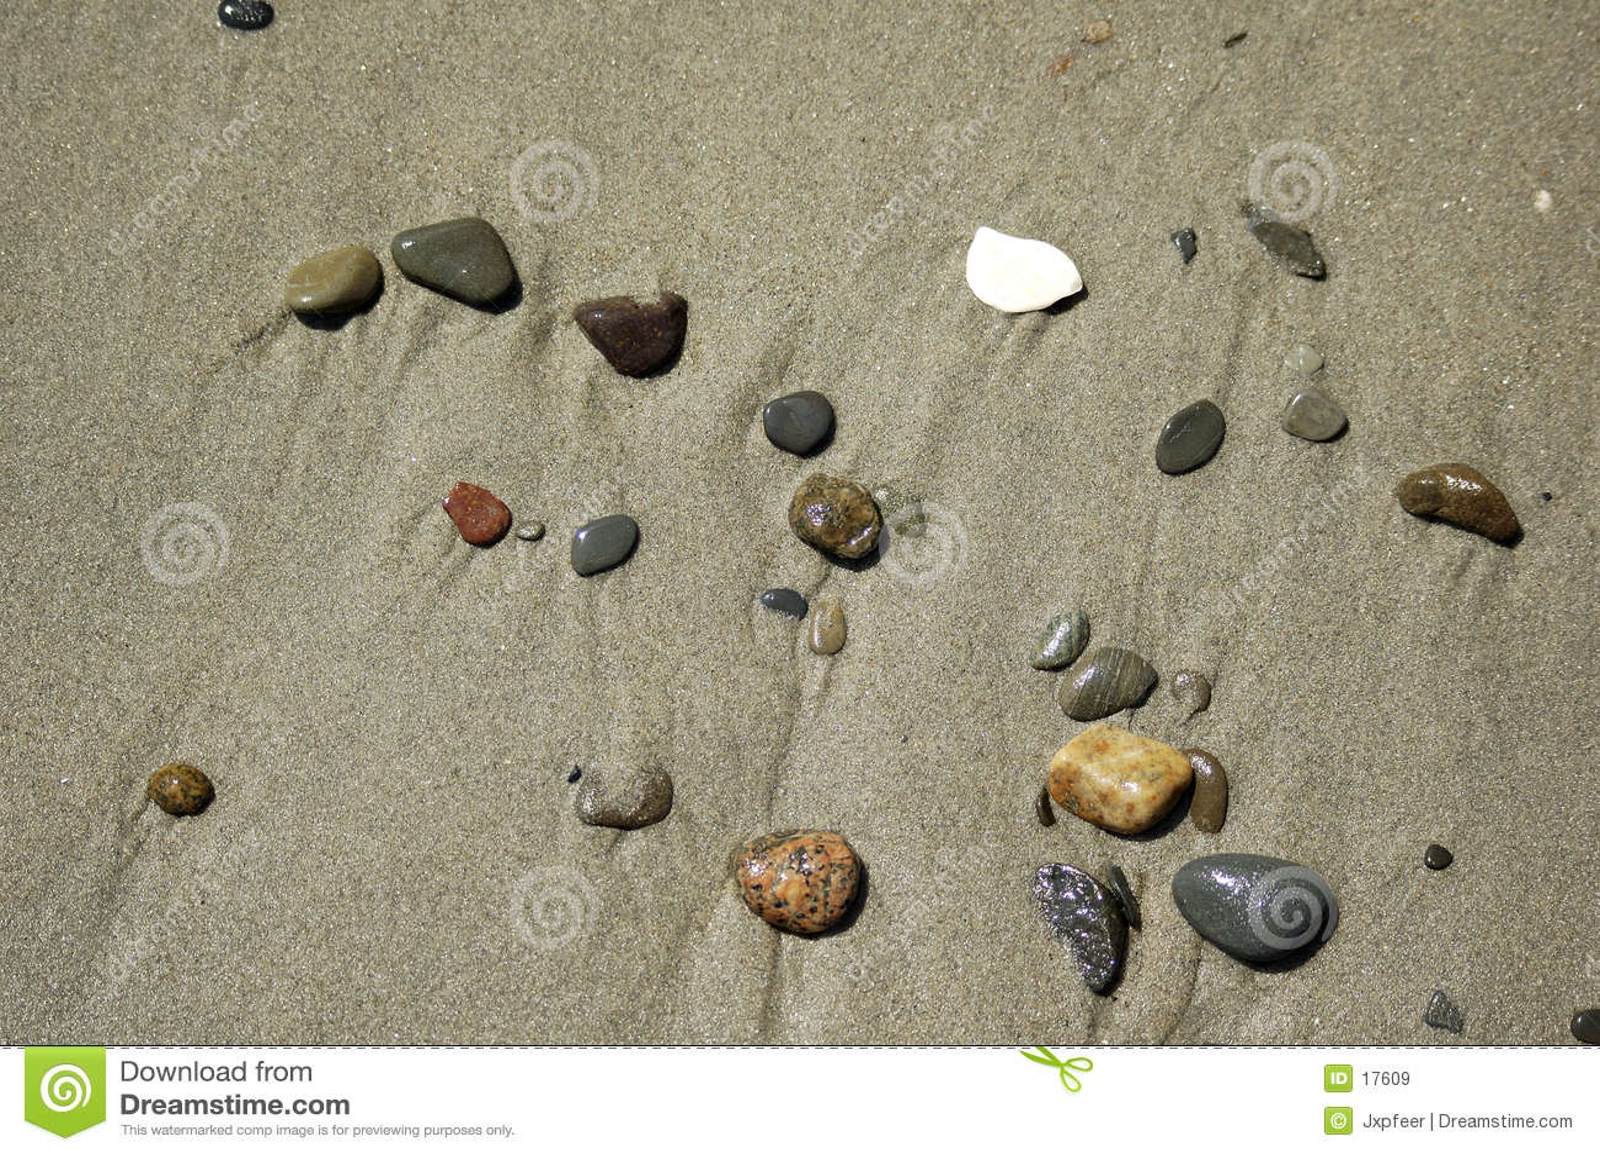 камушки пляжа зашкурят место